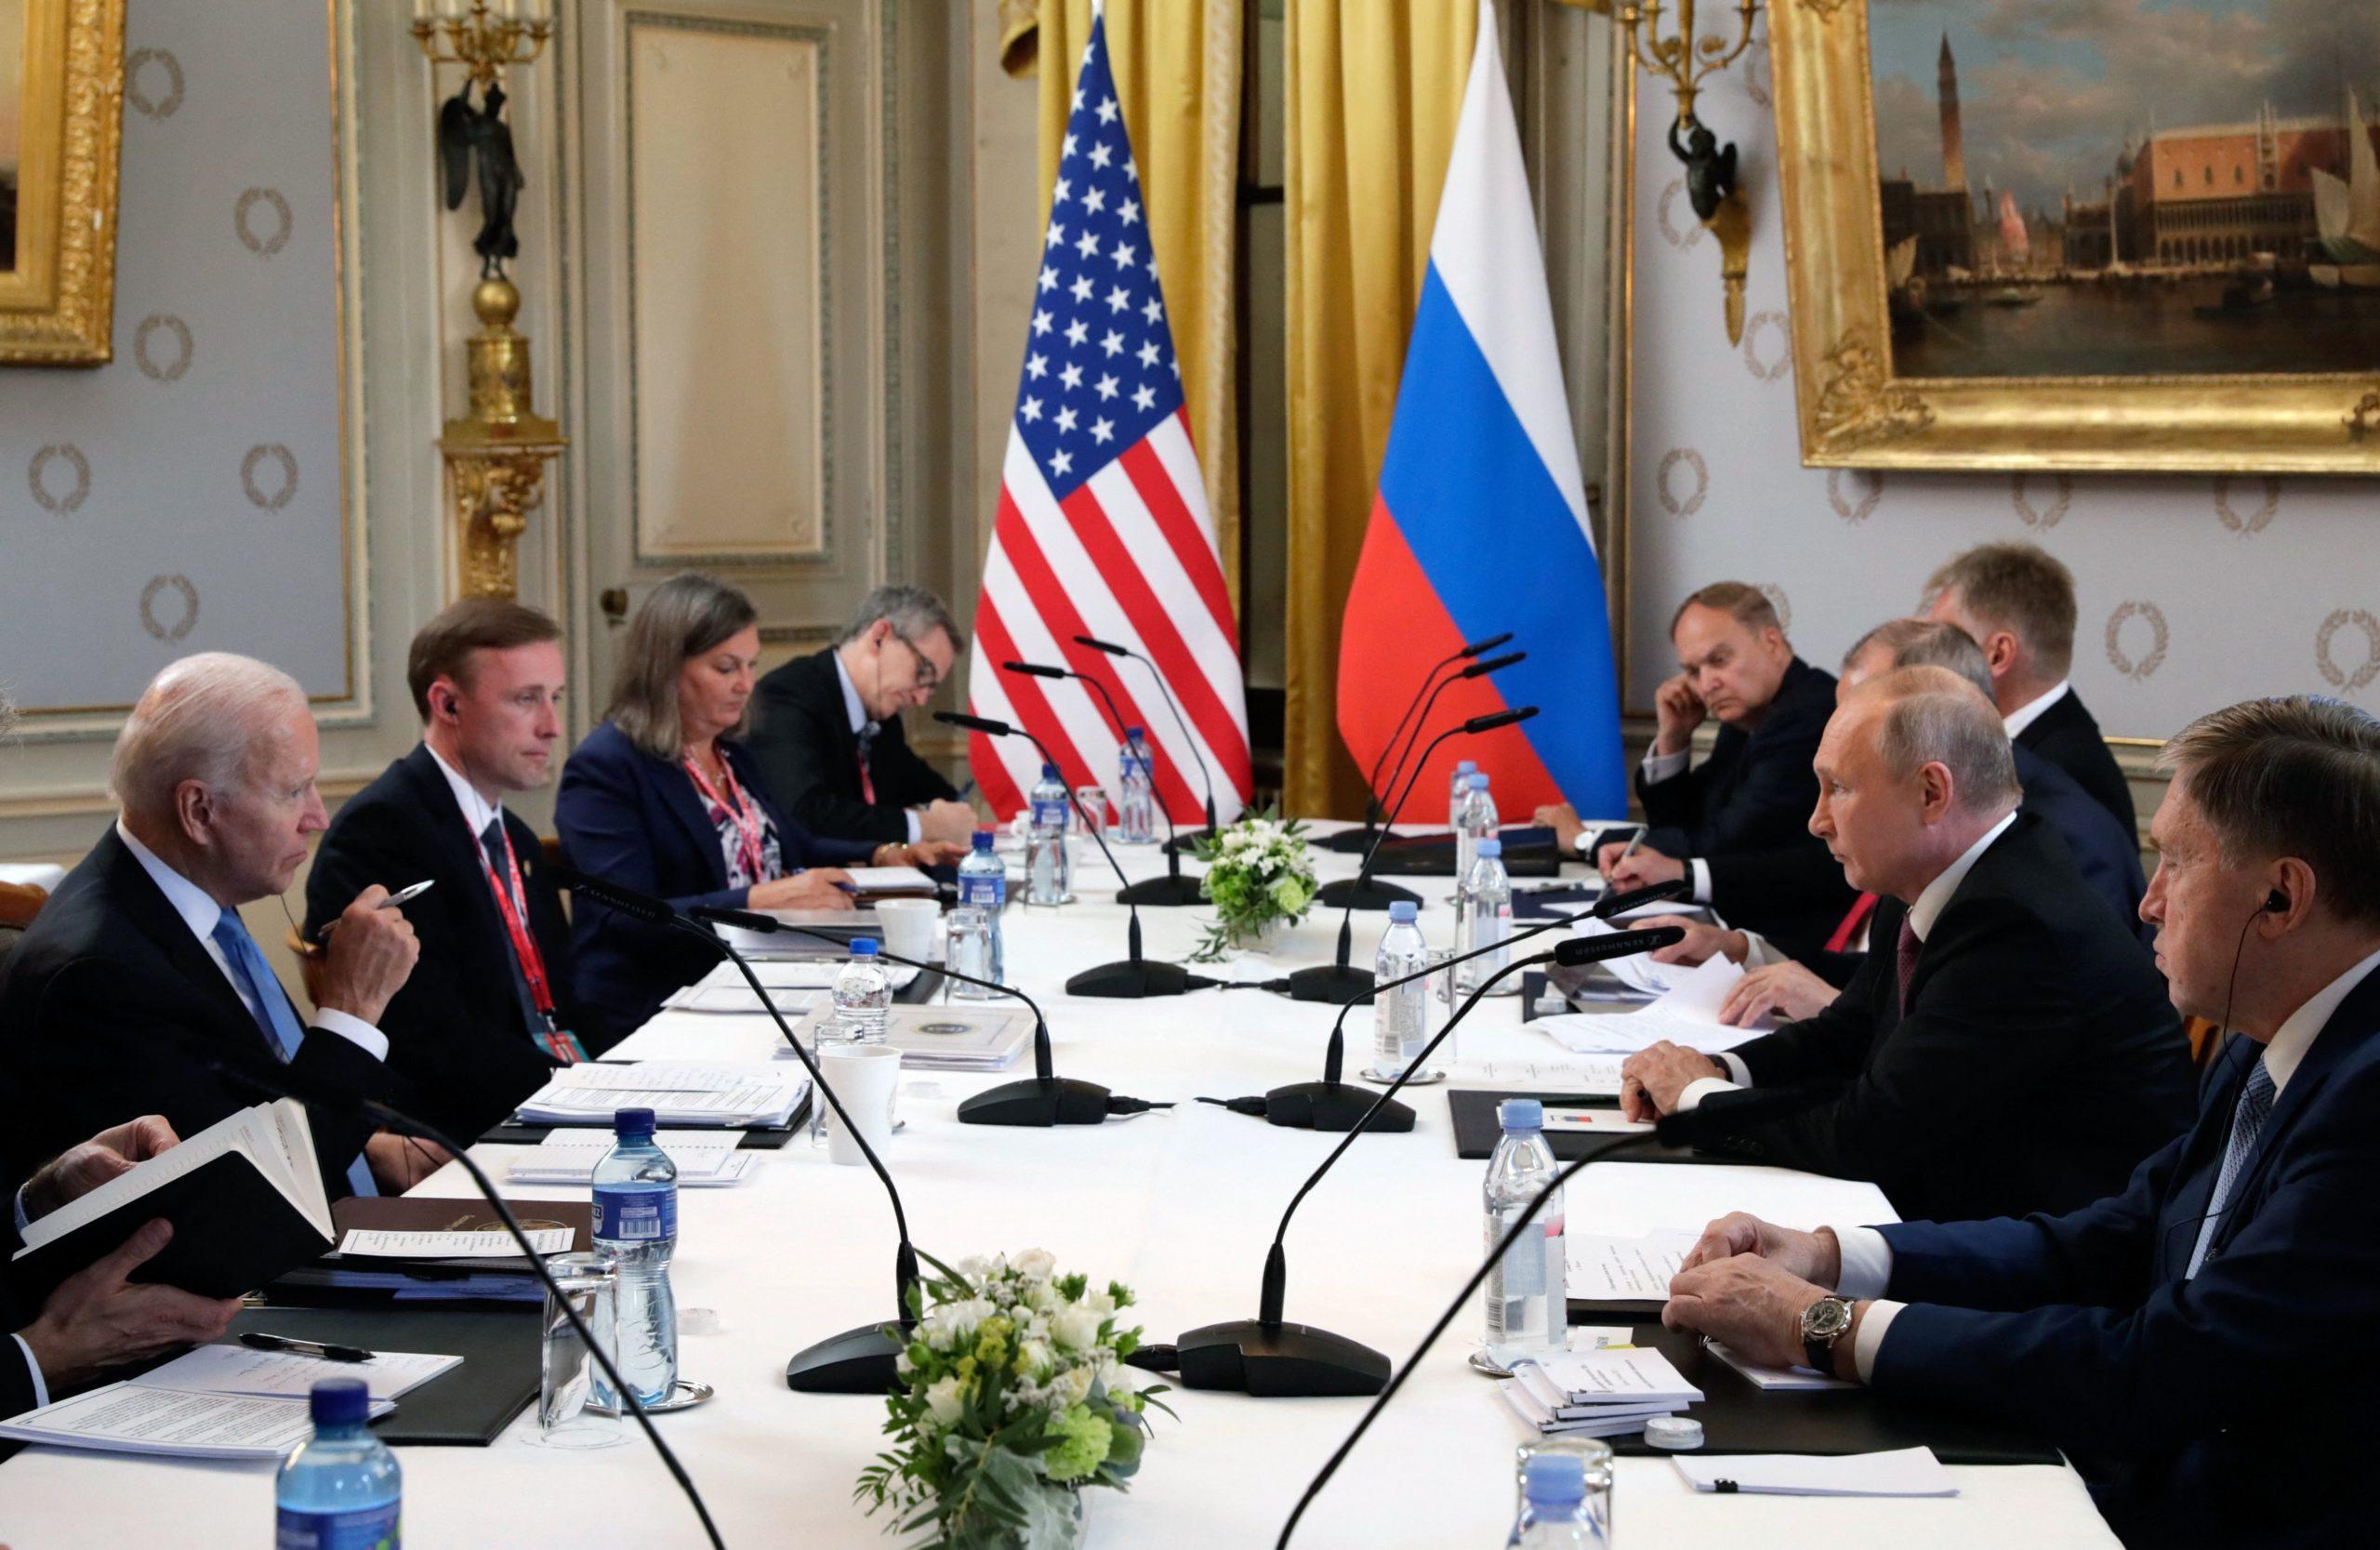 President Joe Biden meets with Russian President Vladimir Putin in Geneva, Switzerland on Wednesday. (Mikhail Metzel/Sputnik/AFP via Getty Images)